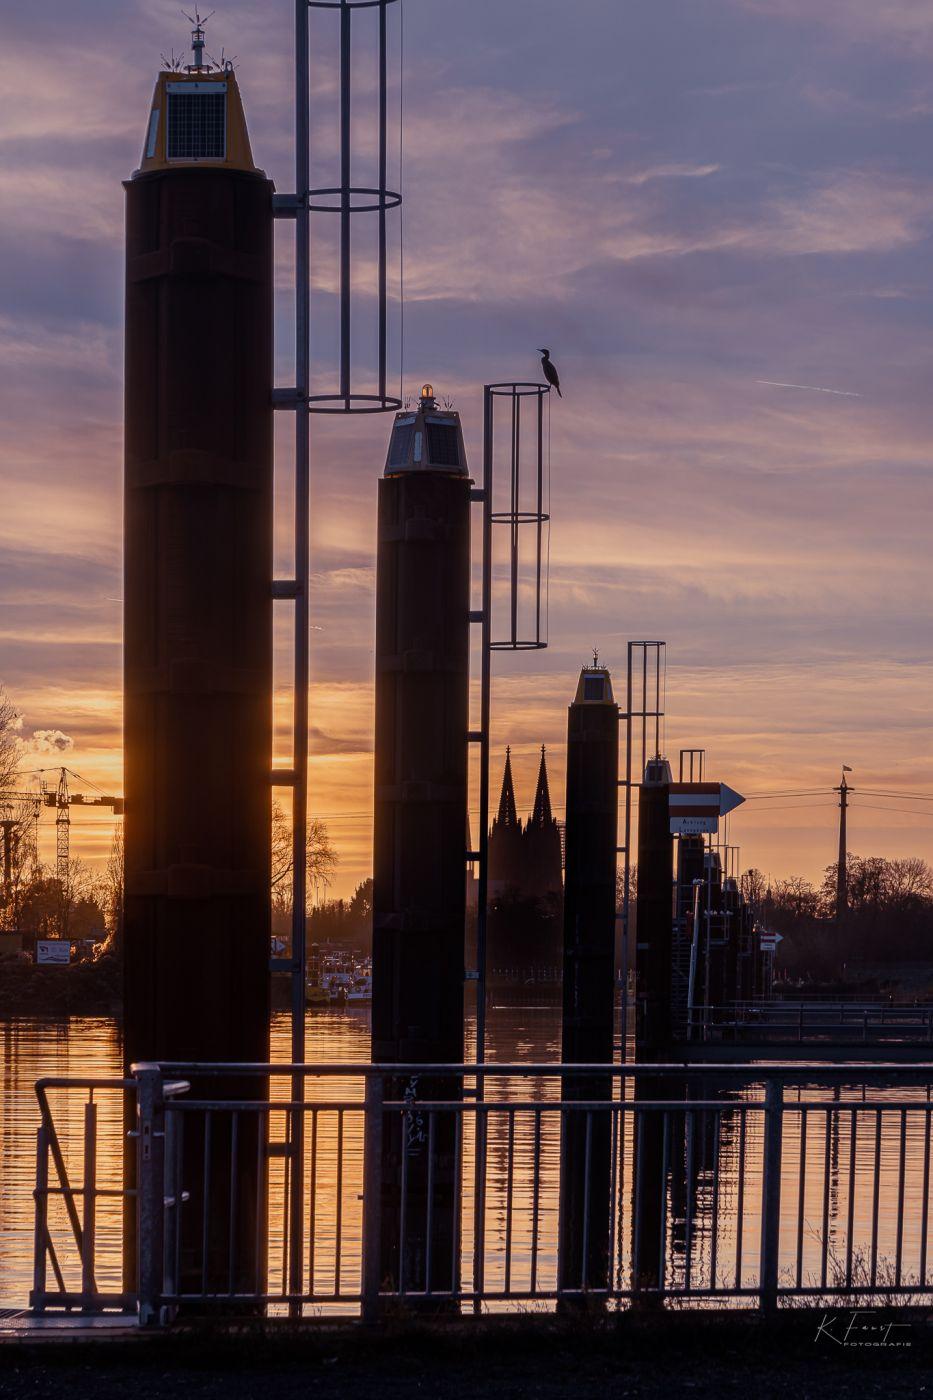 Mülheimer Hafen (harbour), Germany